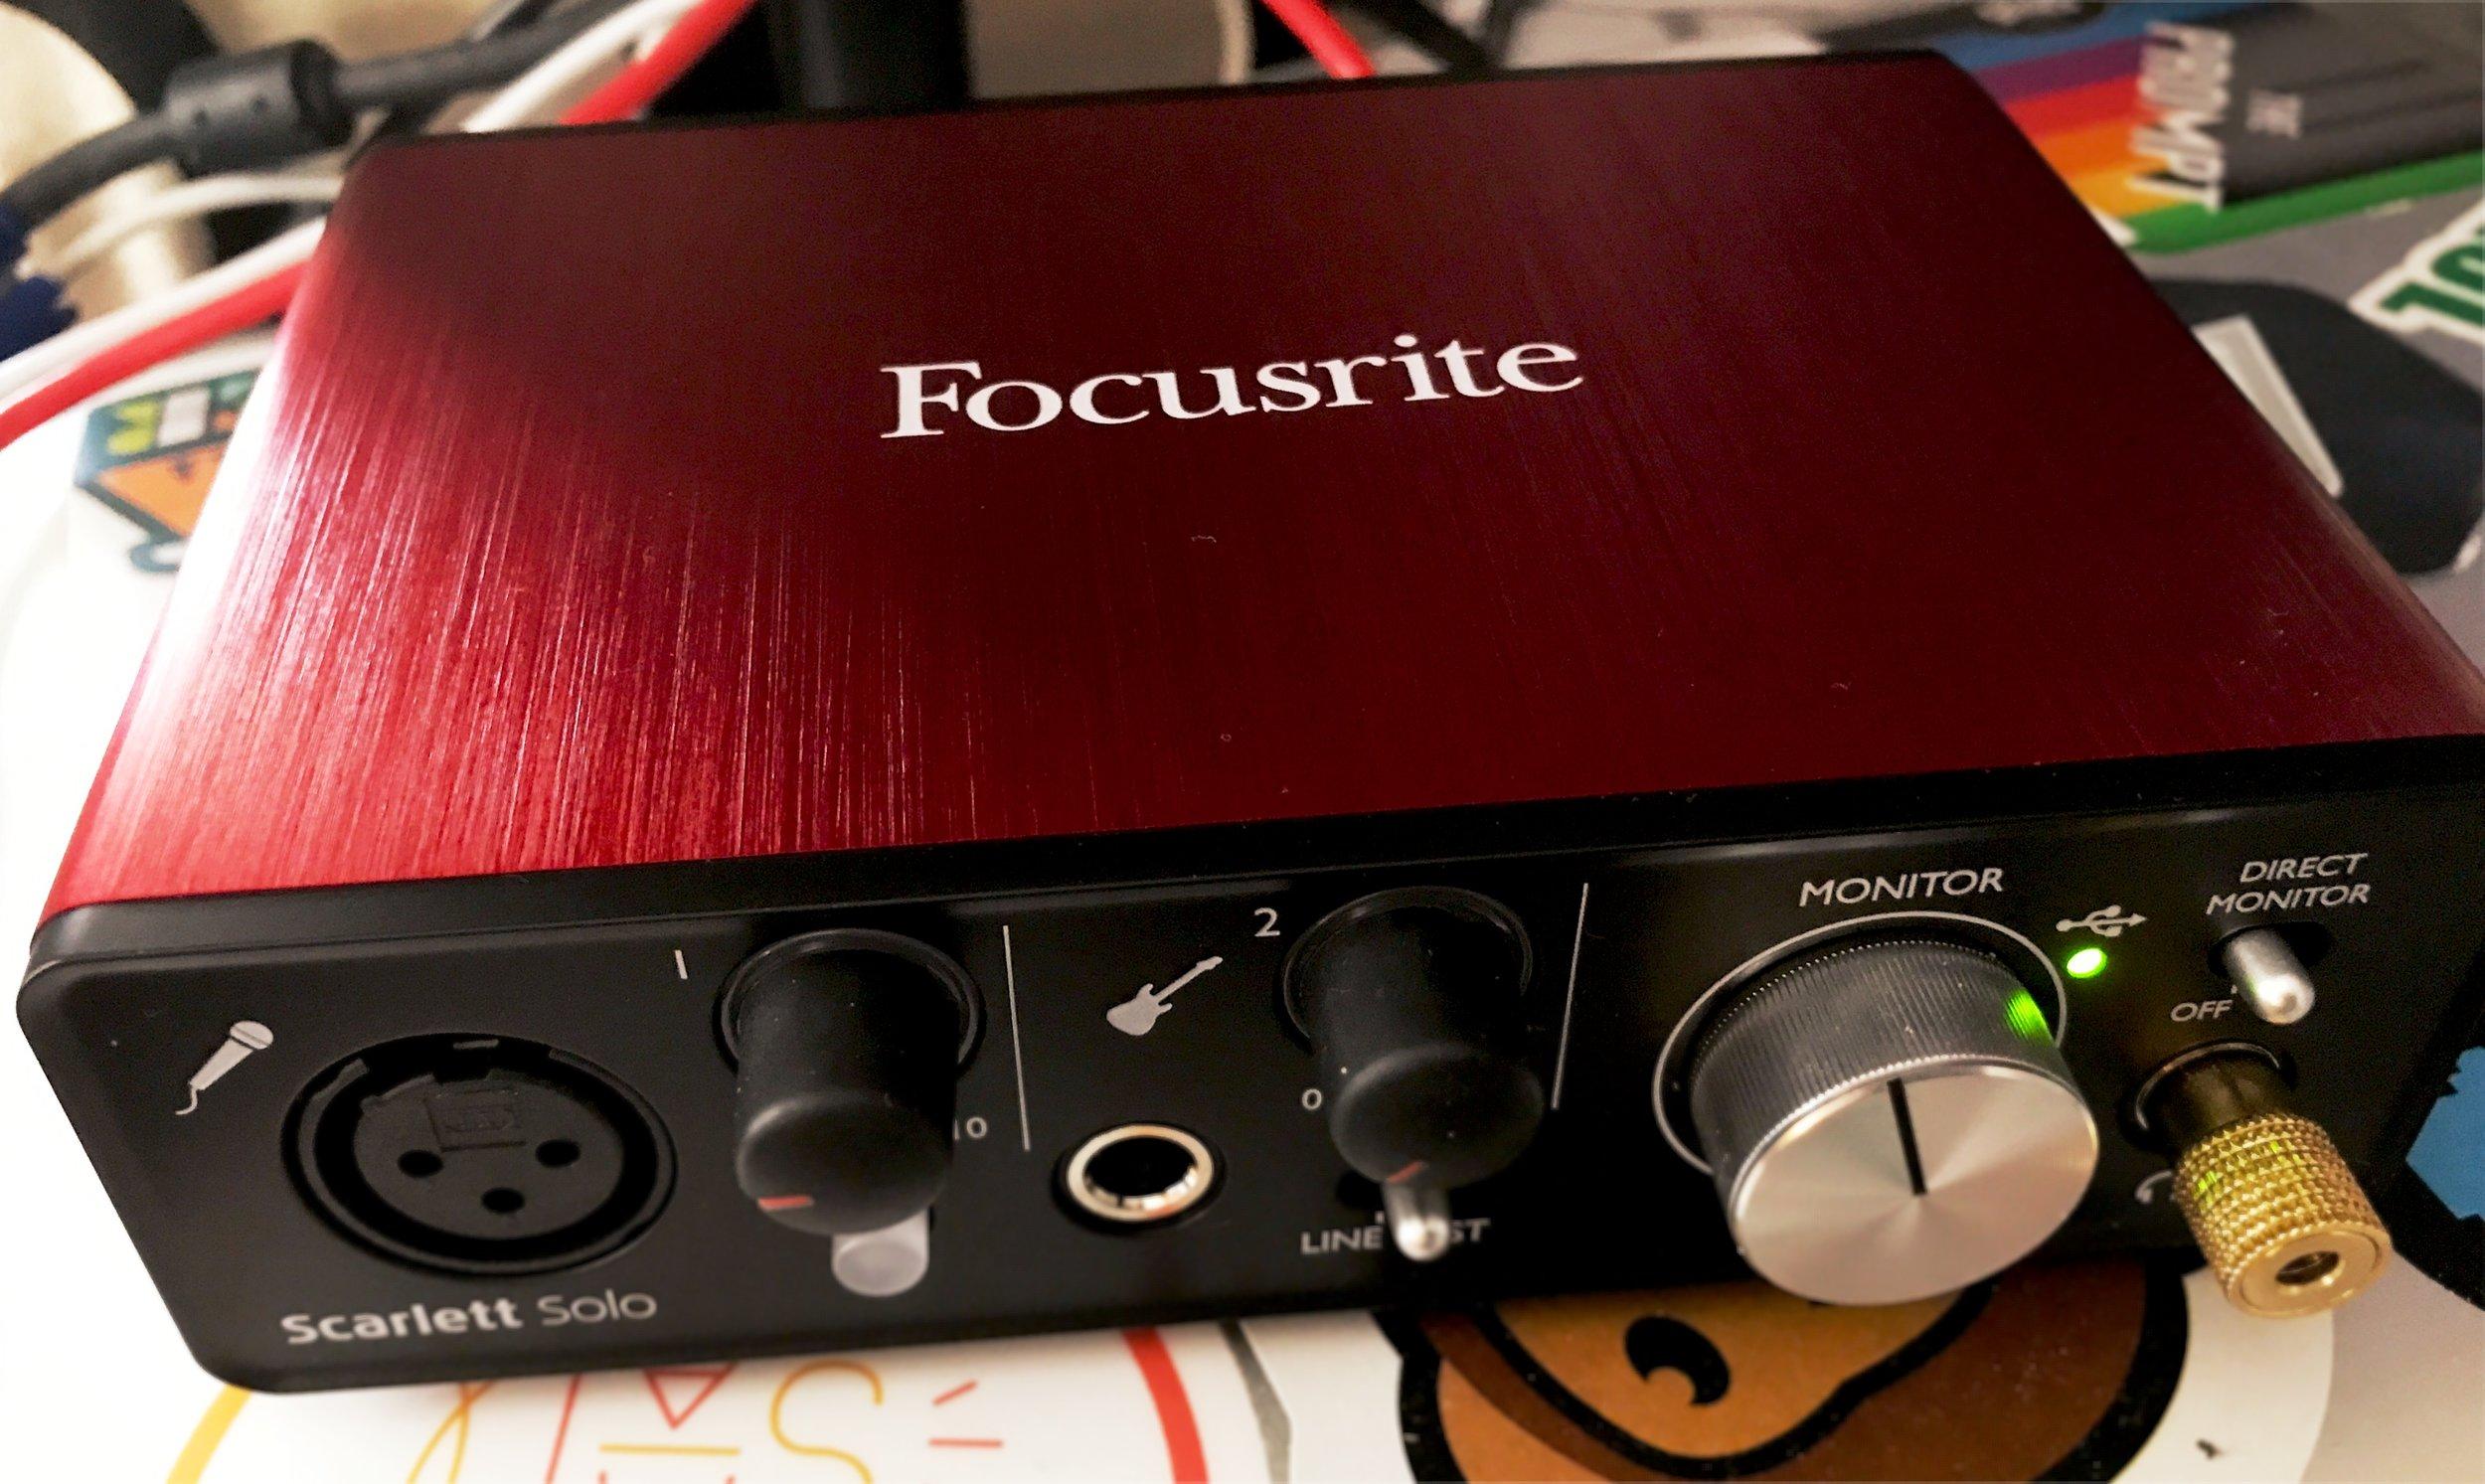 focusrite_scarlett_audio_interface.jpeg